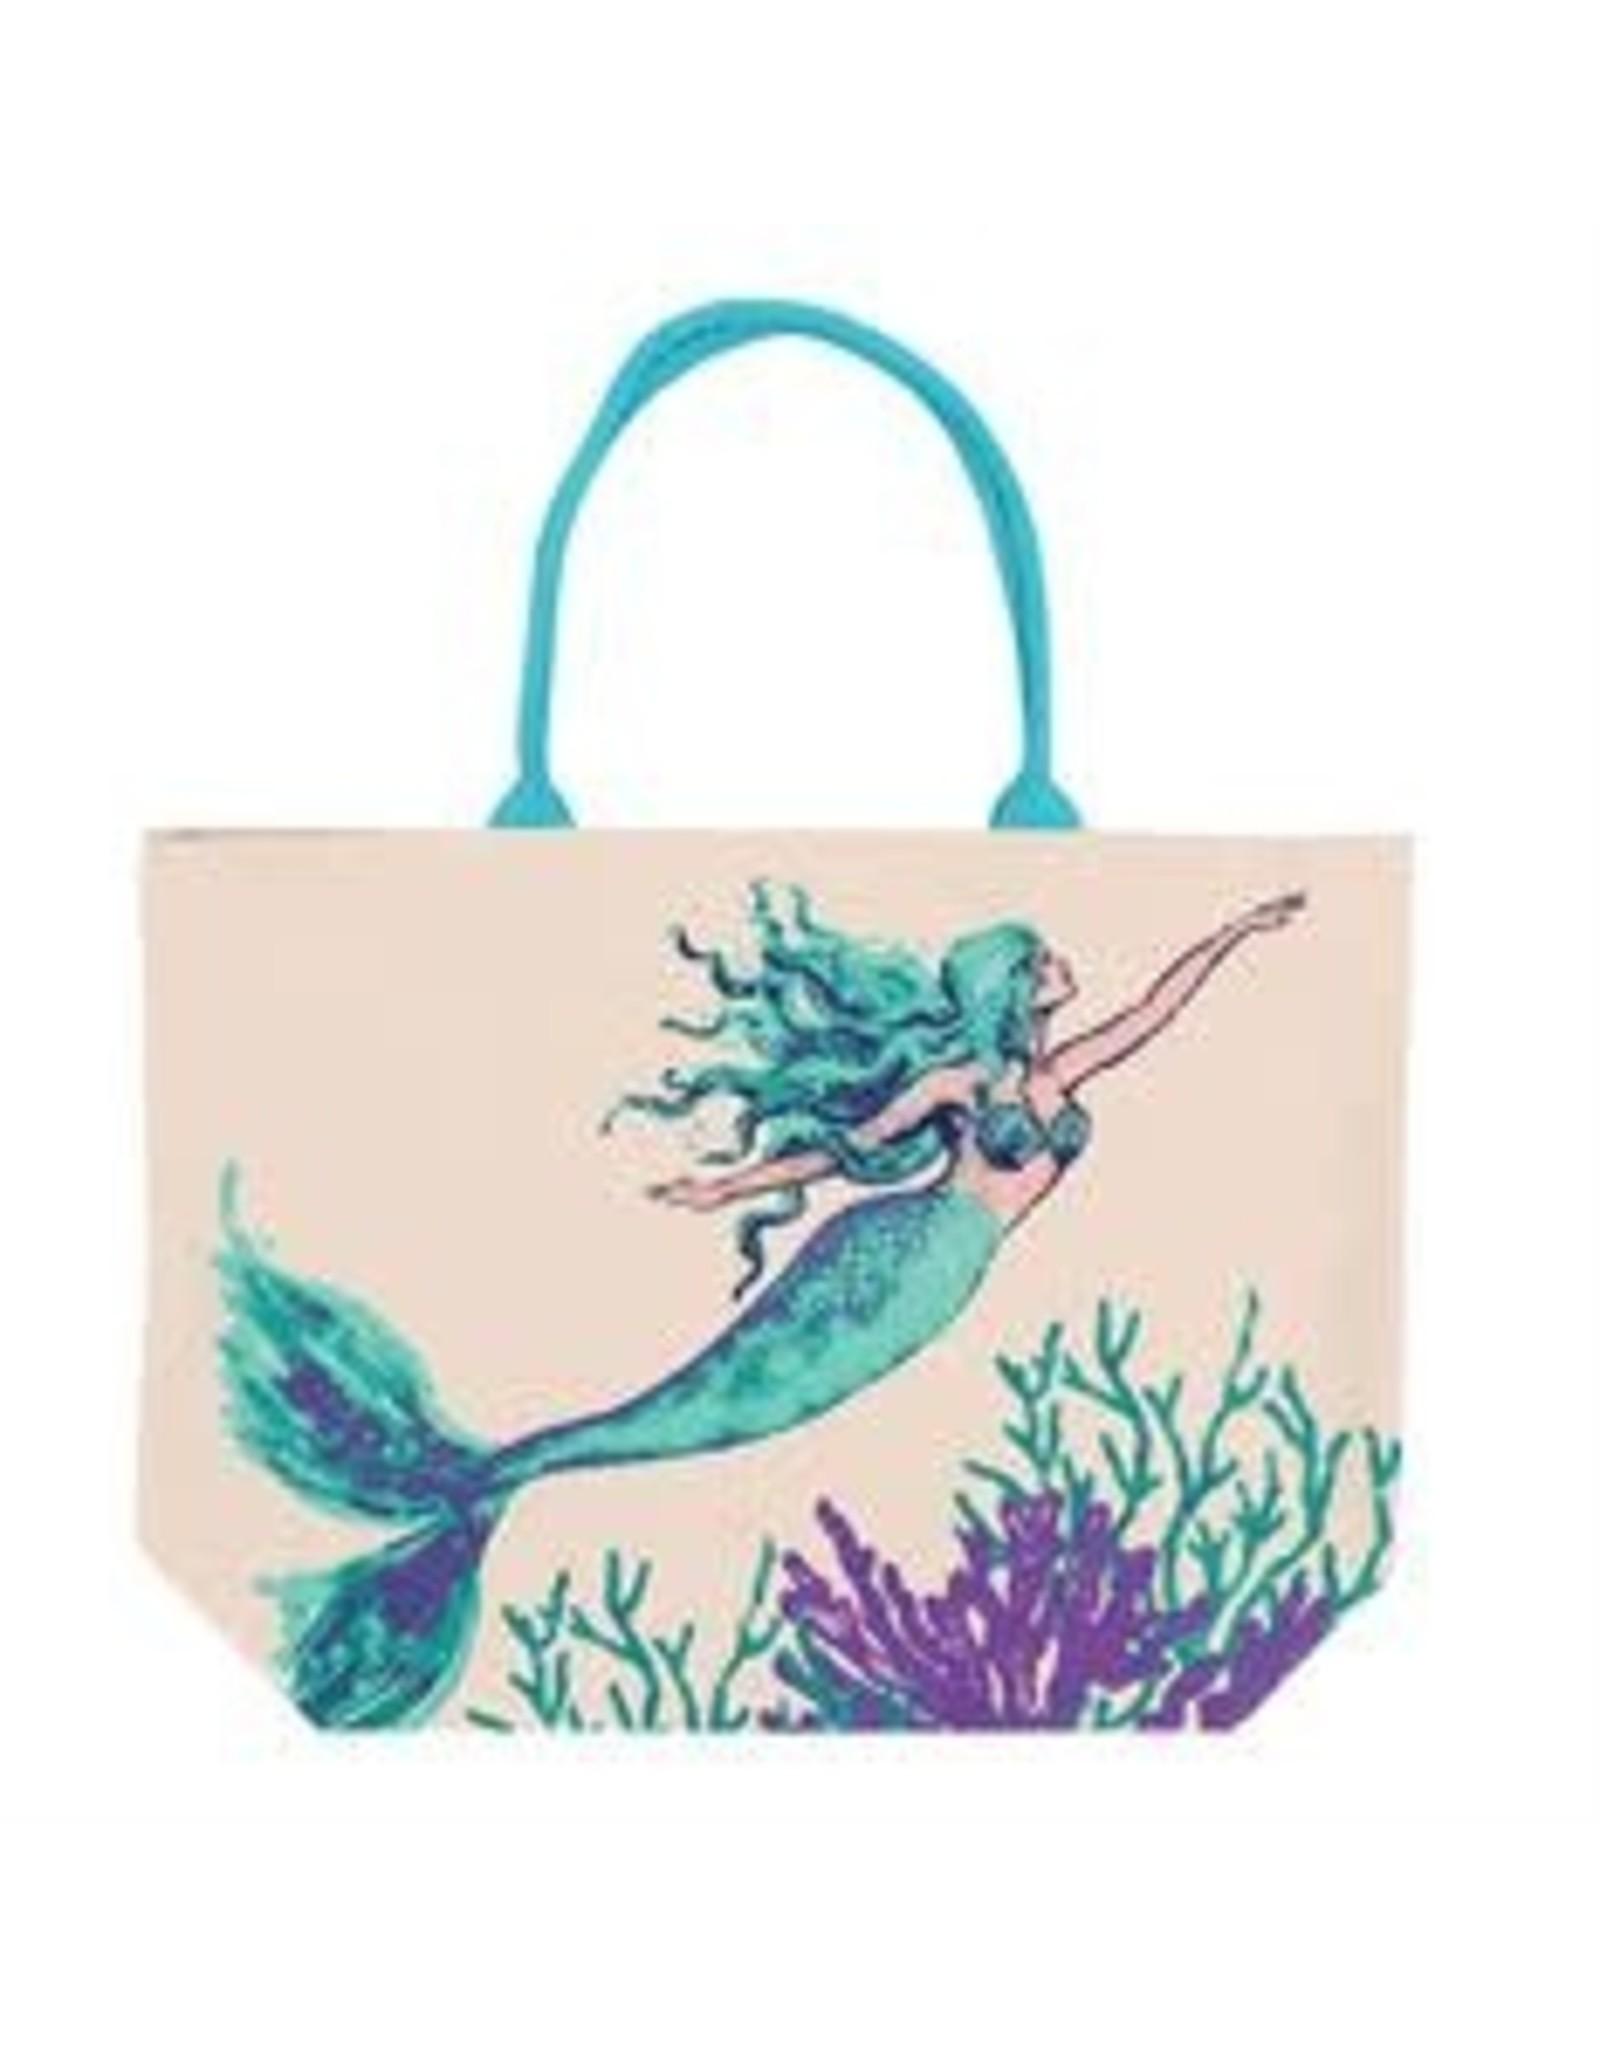 DEI Tote- Mermaid Print